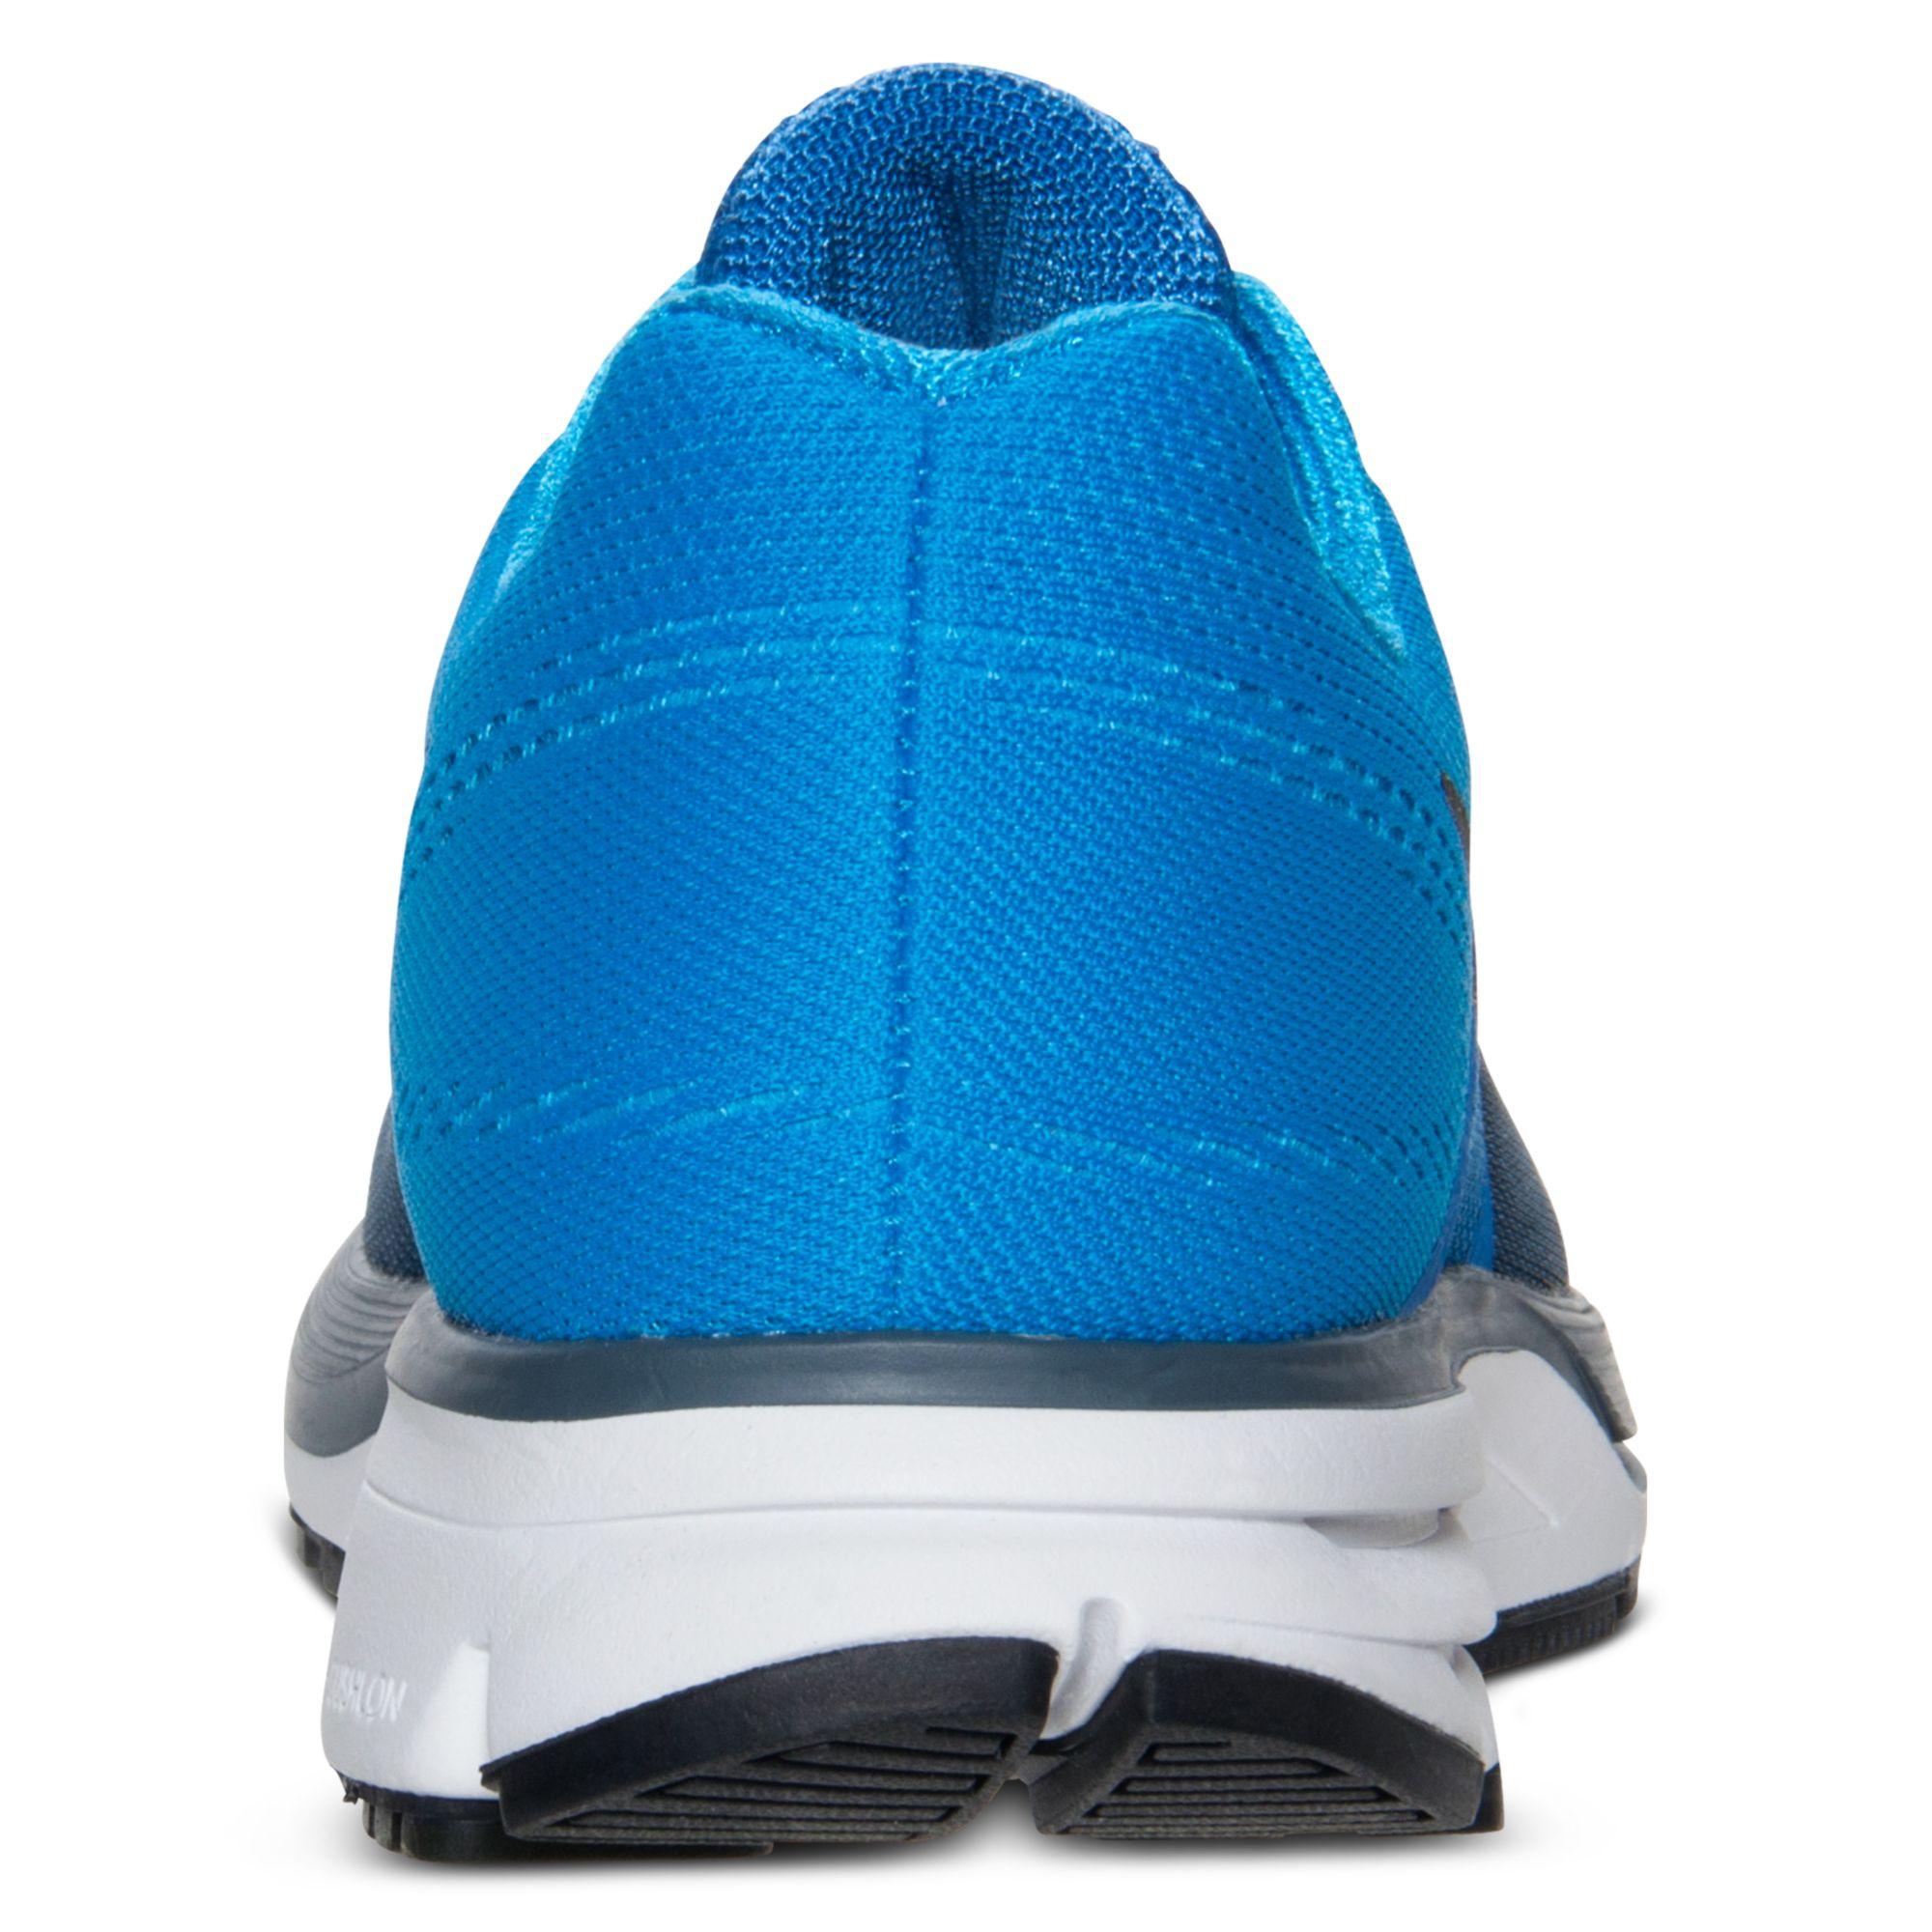 nike pegasus 30 blue